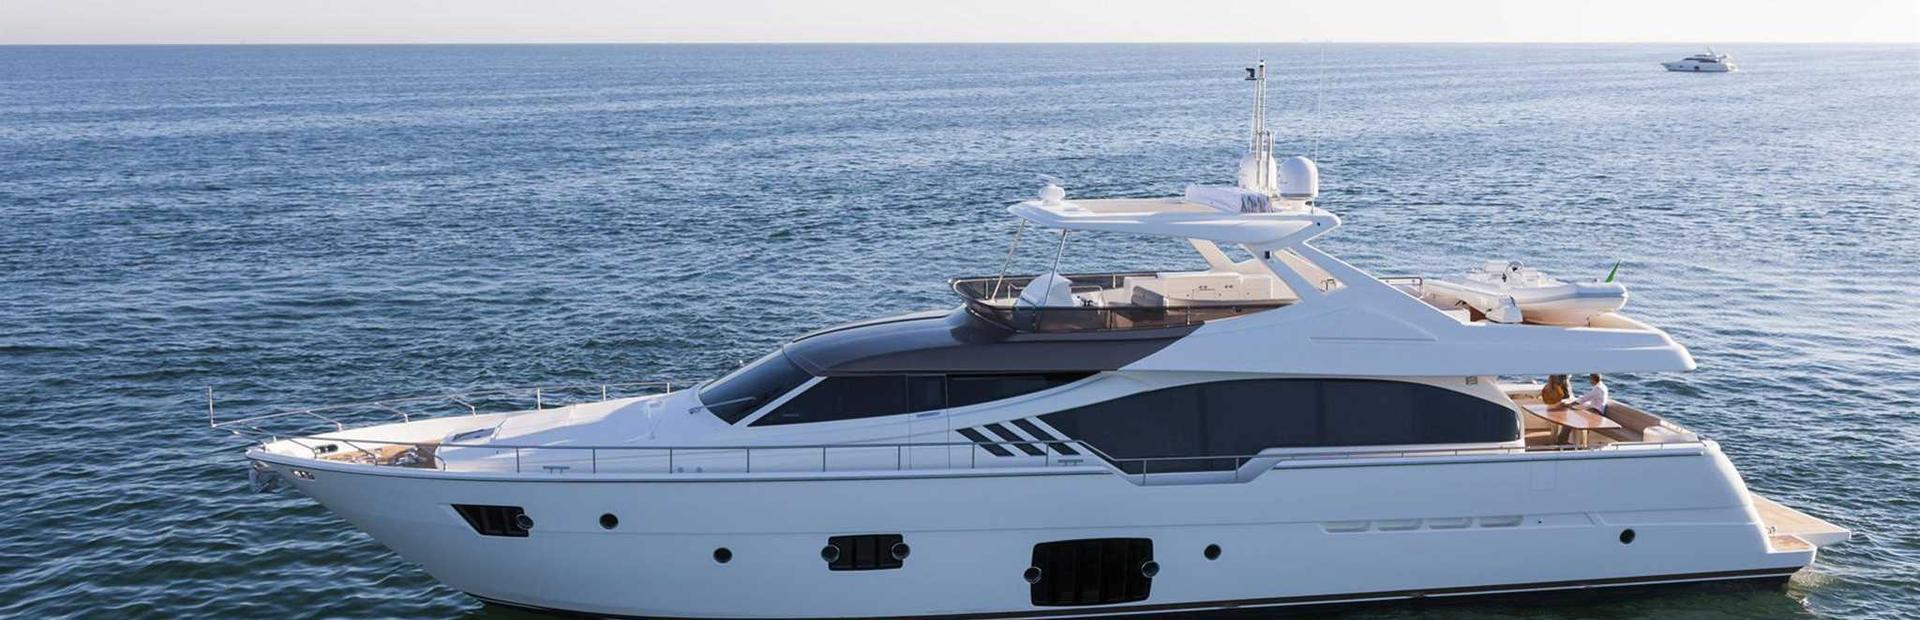 Ferretti Yachts 870 Yacht Charter